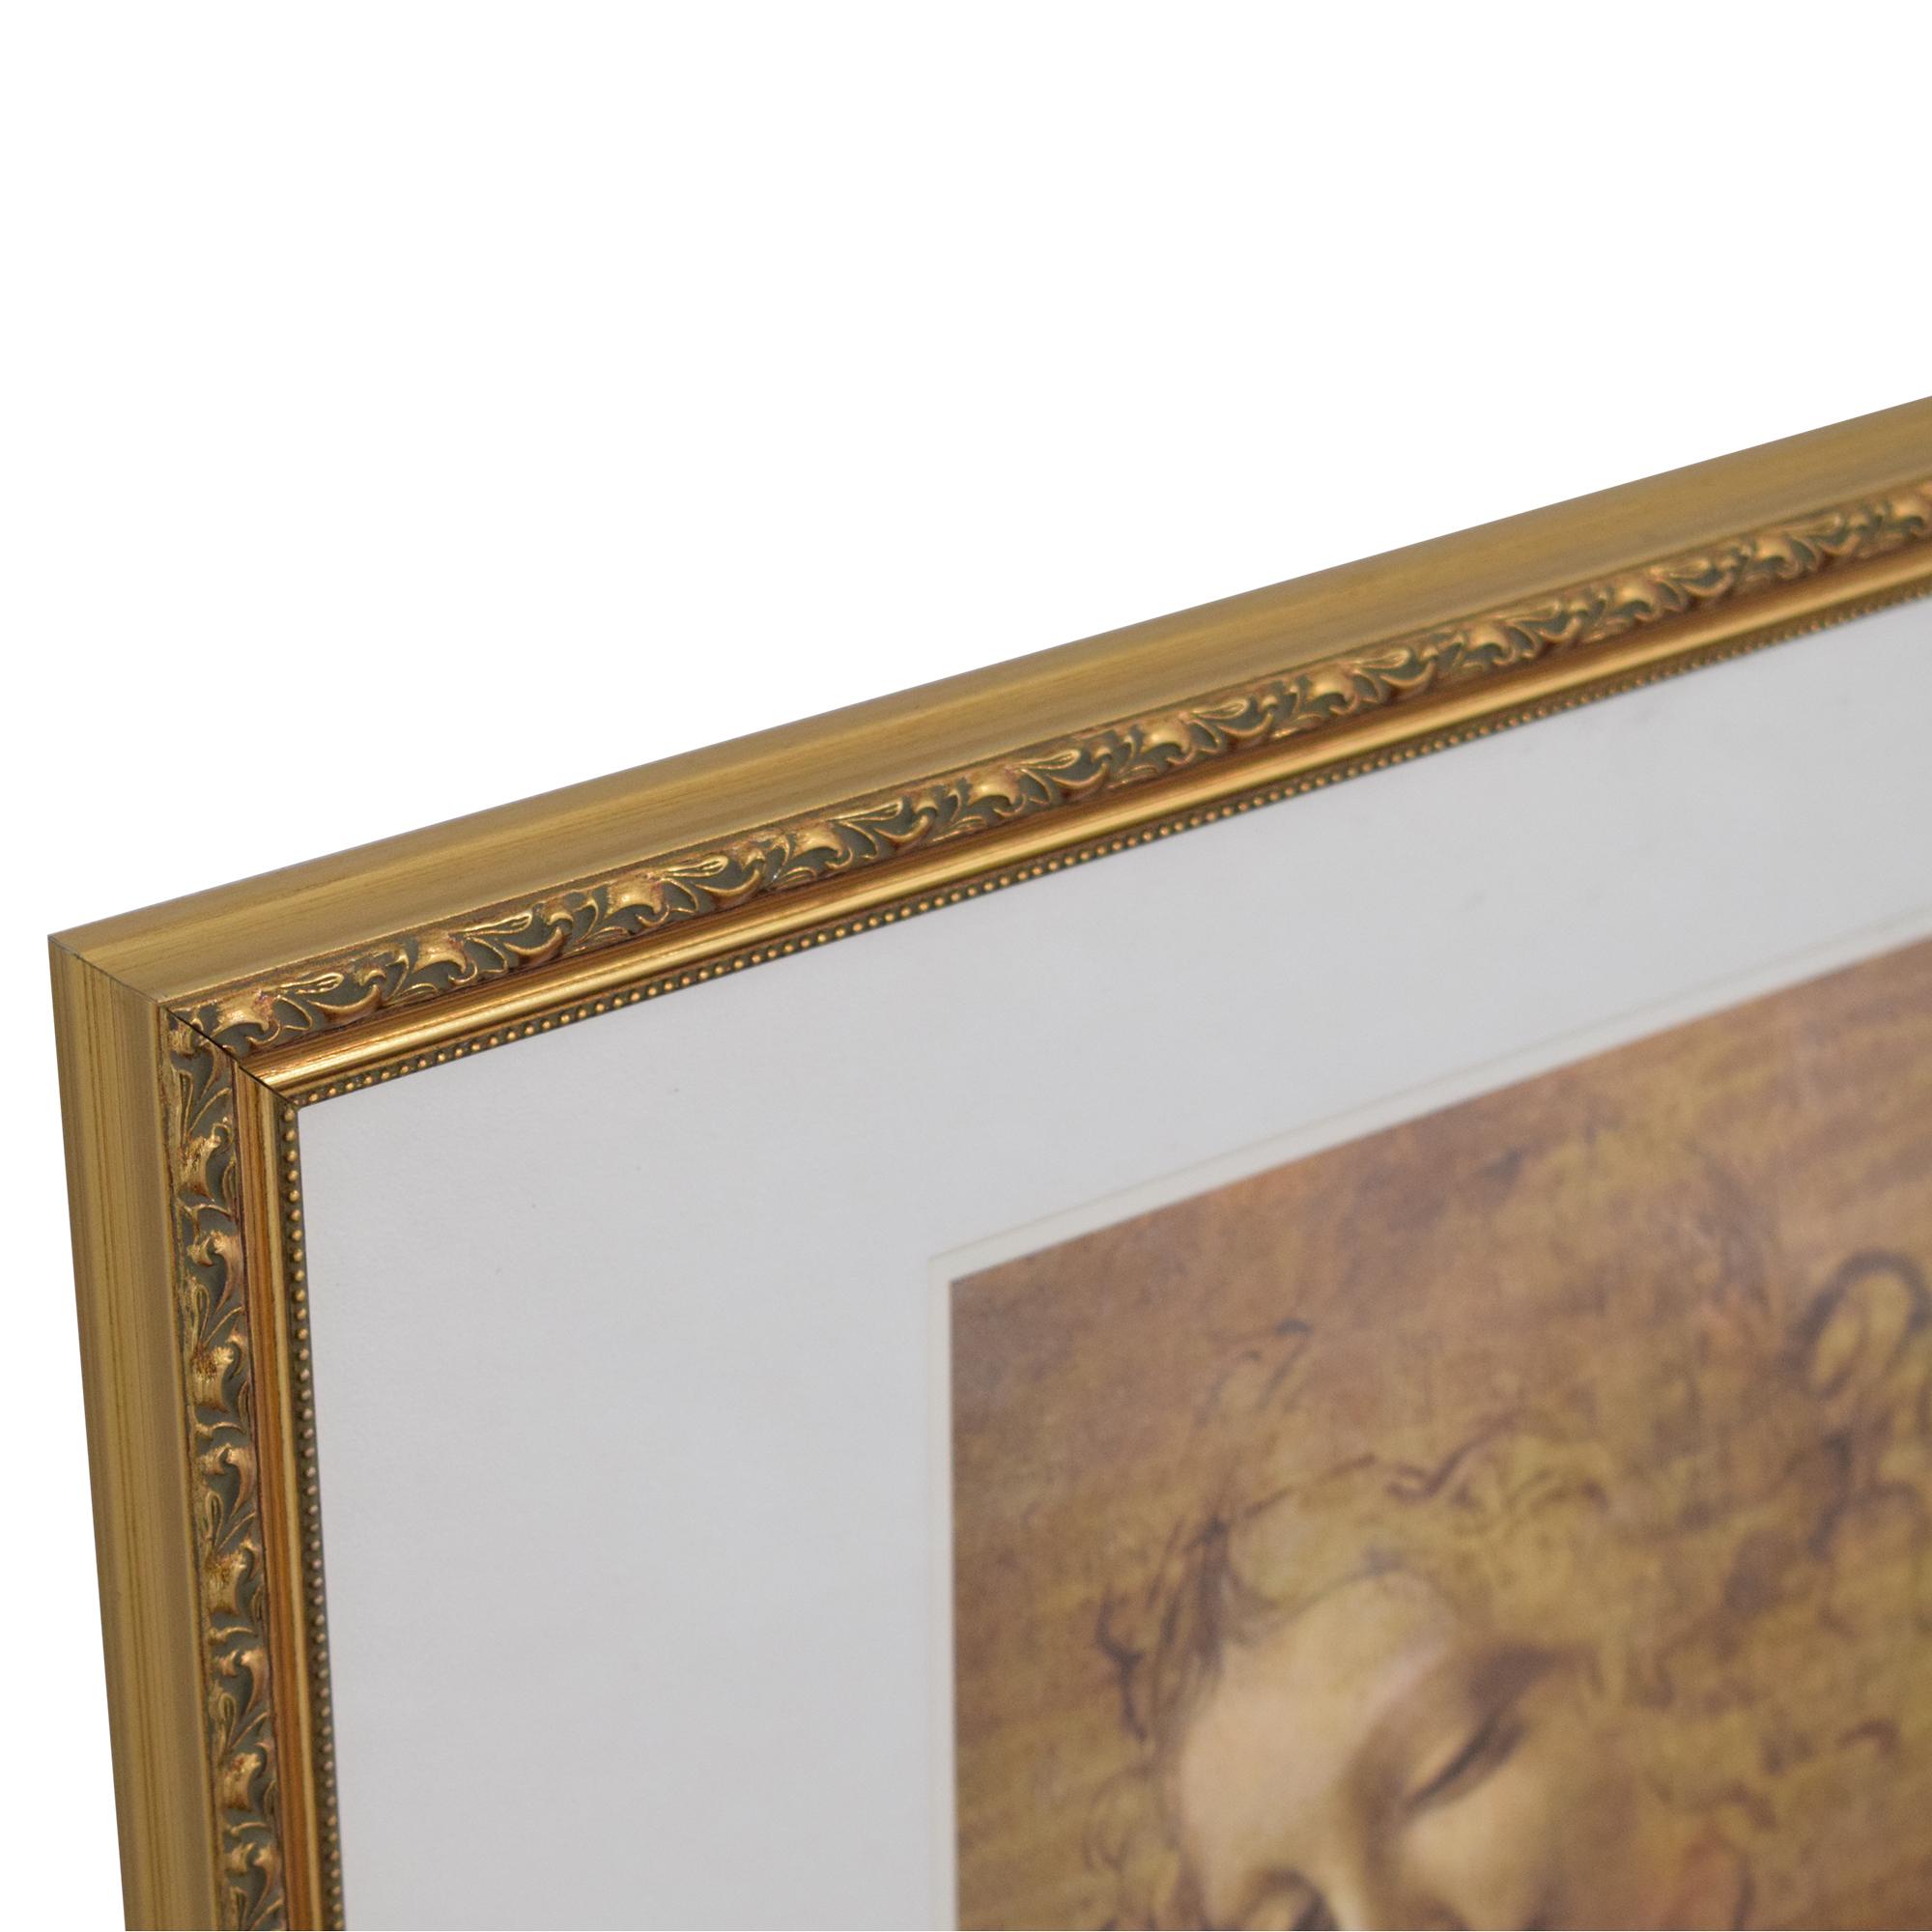 Framed La Scapaliata Da Vinci Wall Art coupon